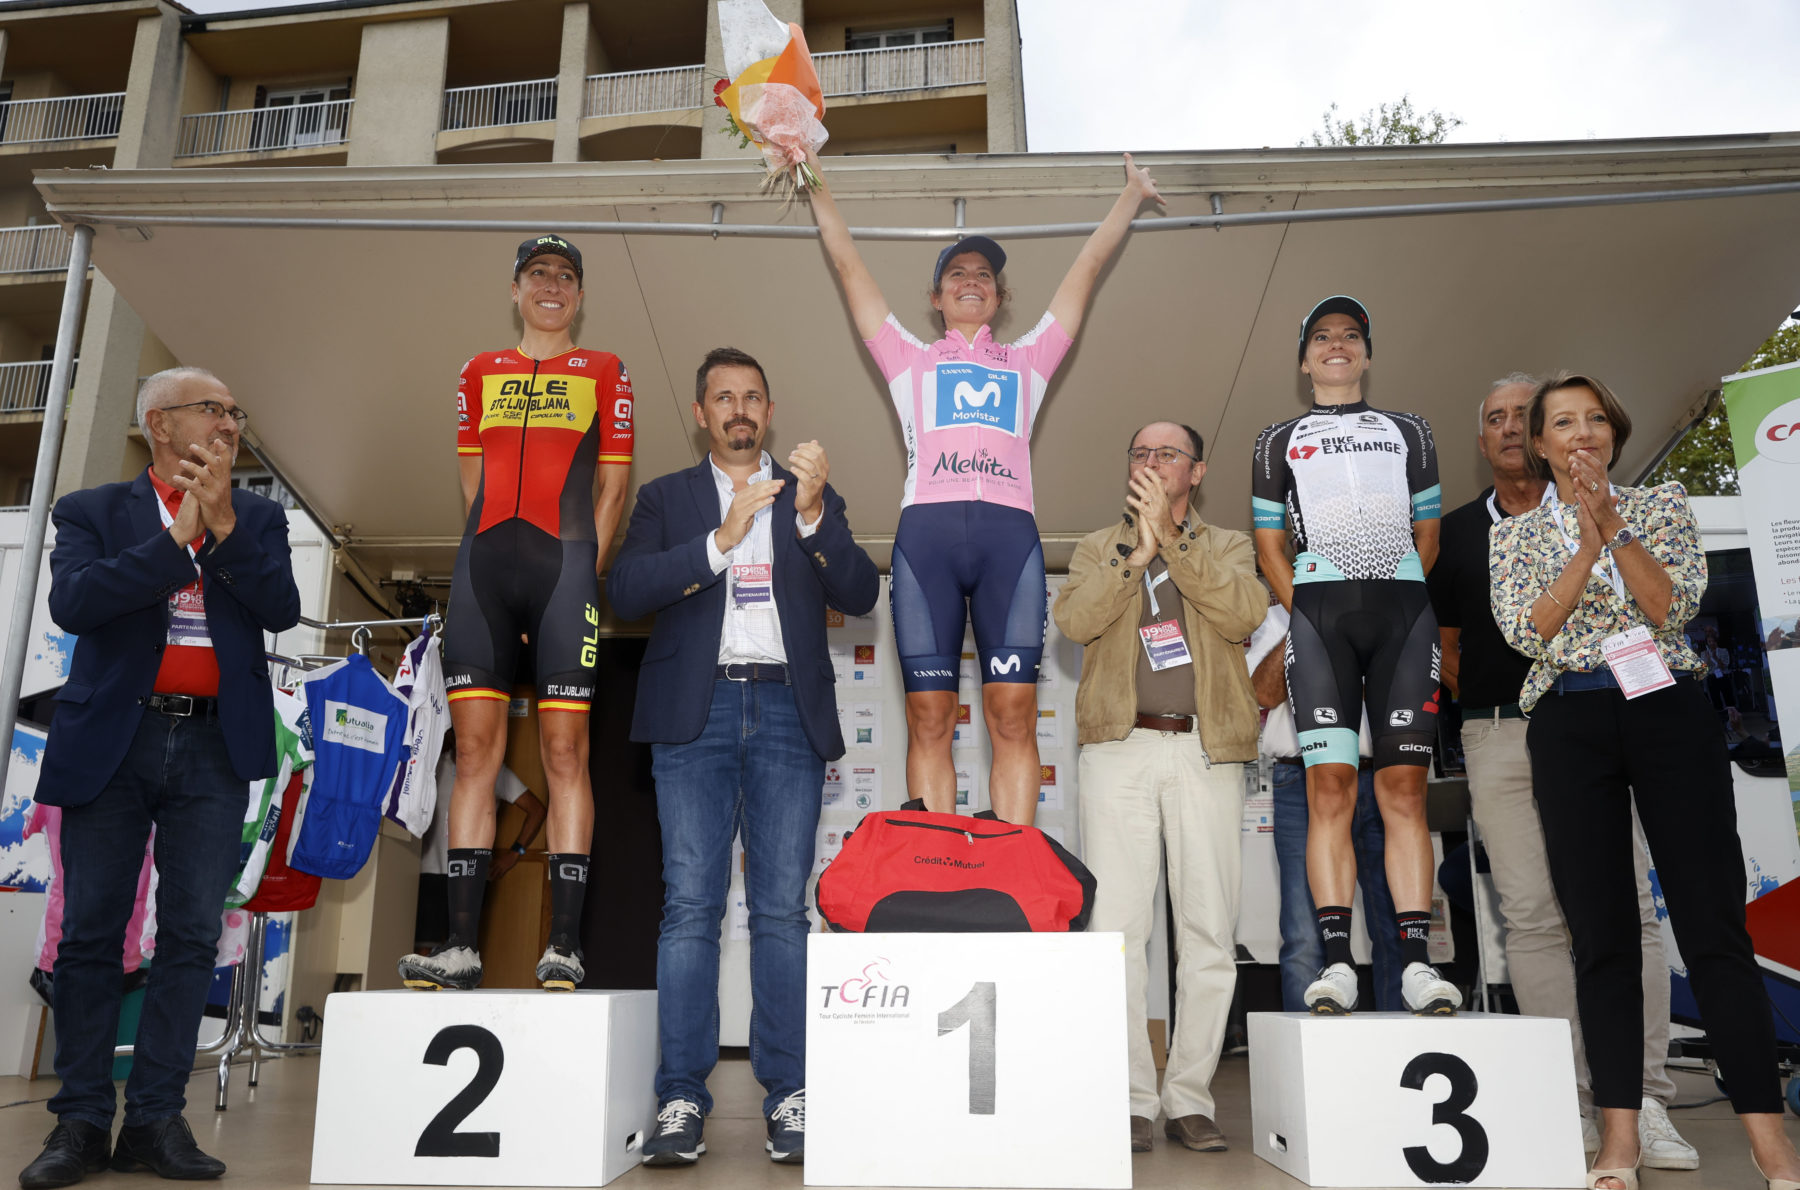 News' image'Leah Thomas y Movistar Team, otra semana fantástica en el Tour de l'Ardèche'